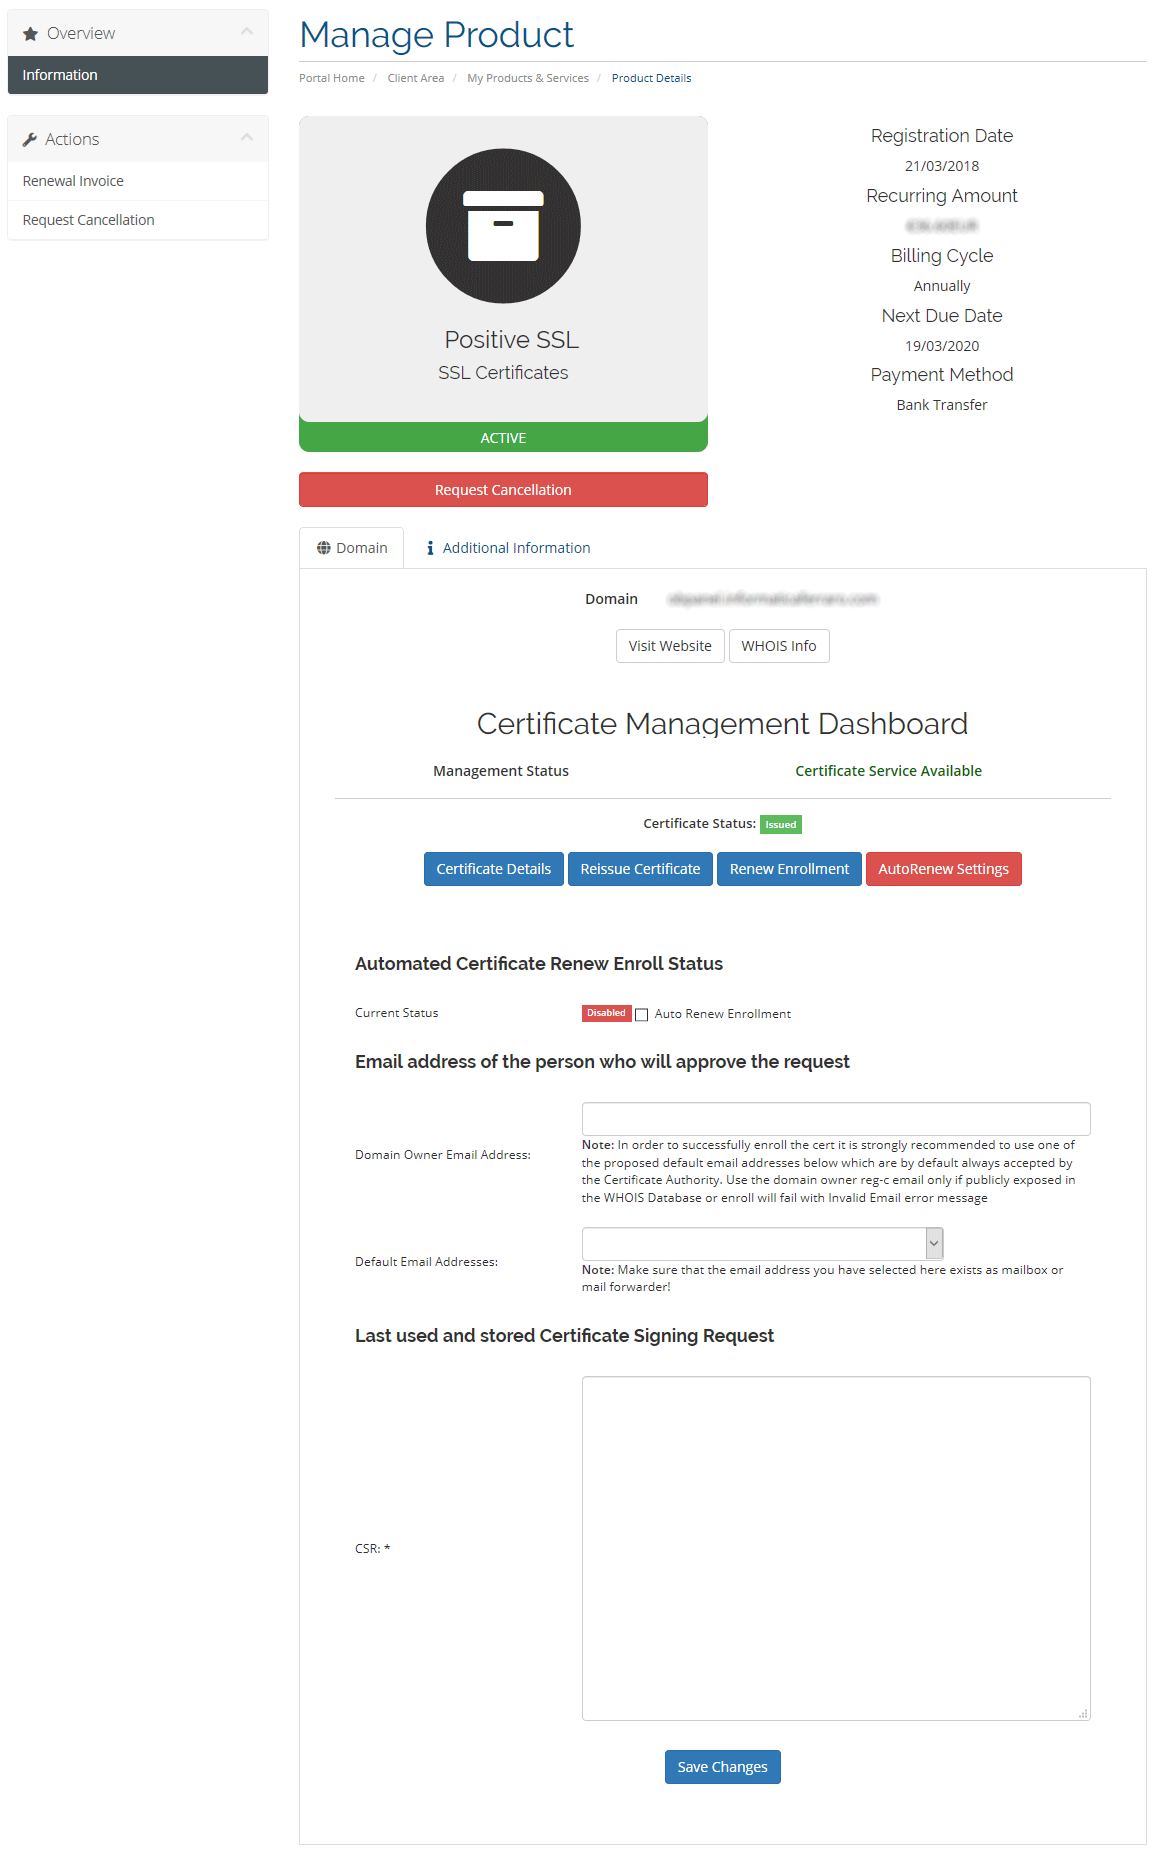 AutRenew Enroll Comodo Certificates